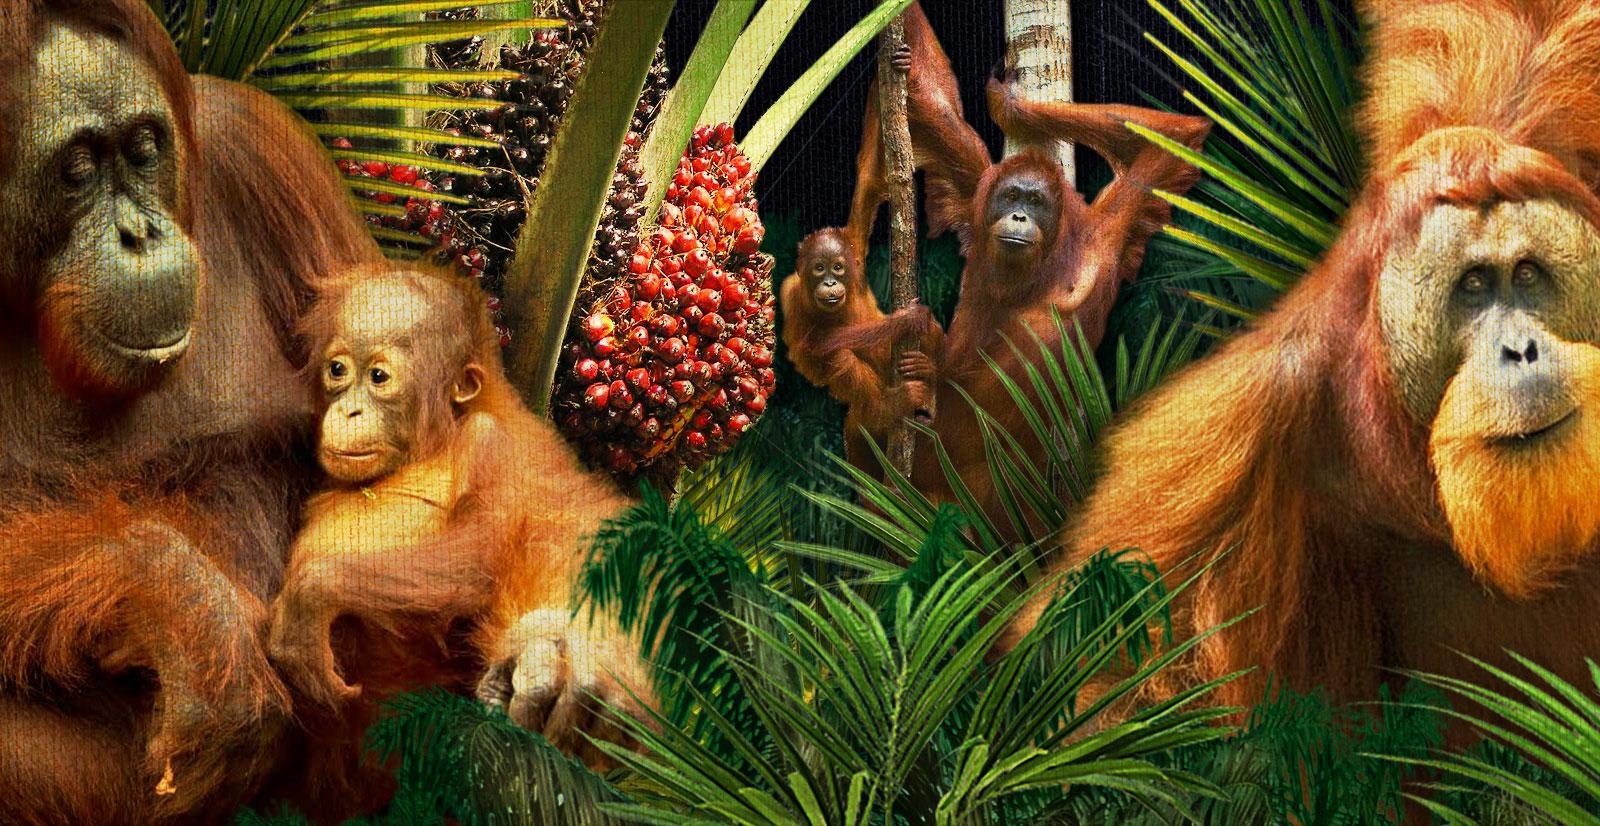 OrangutanSlideMd